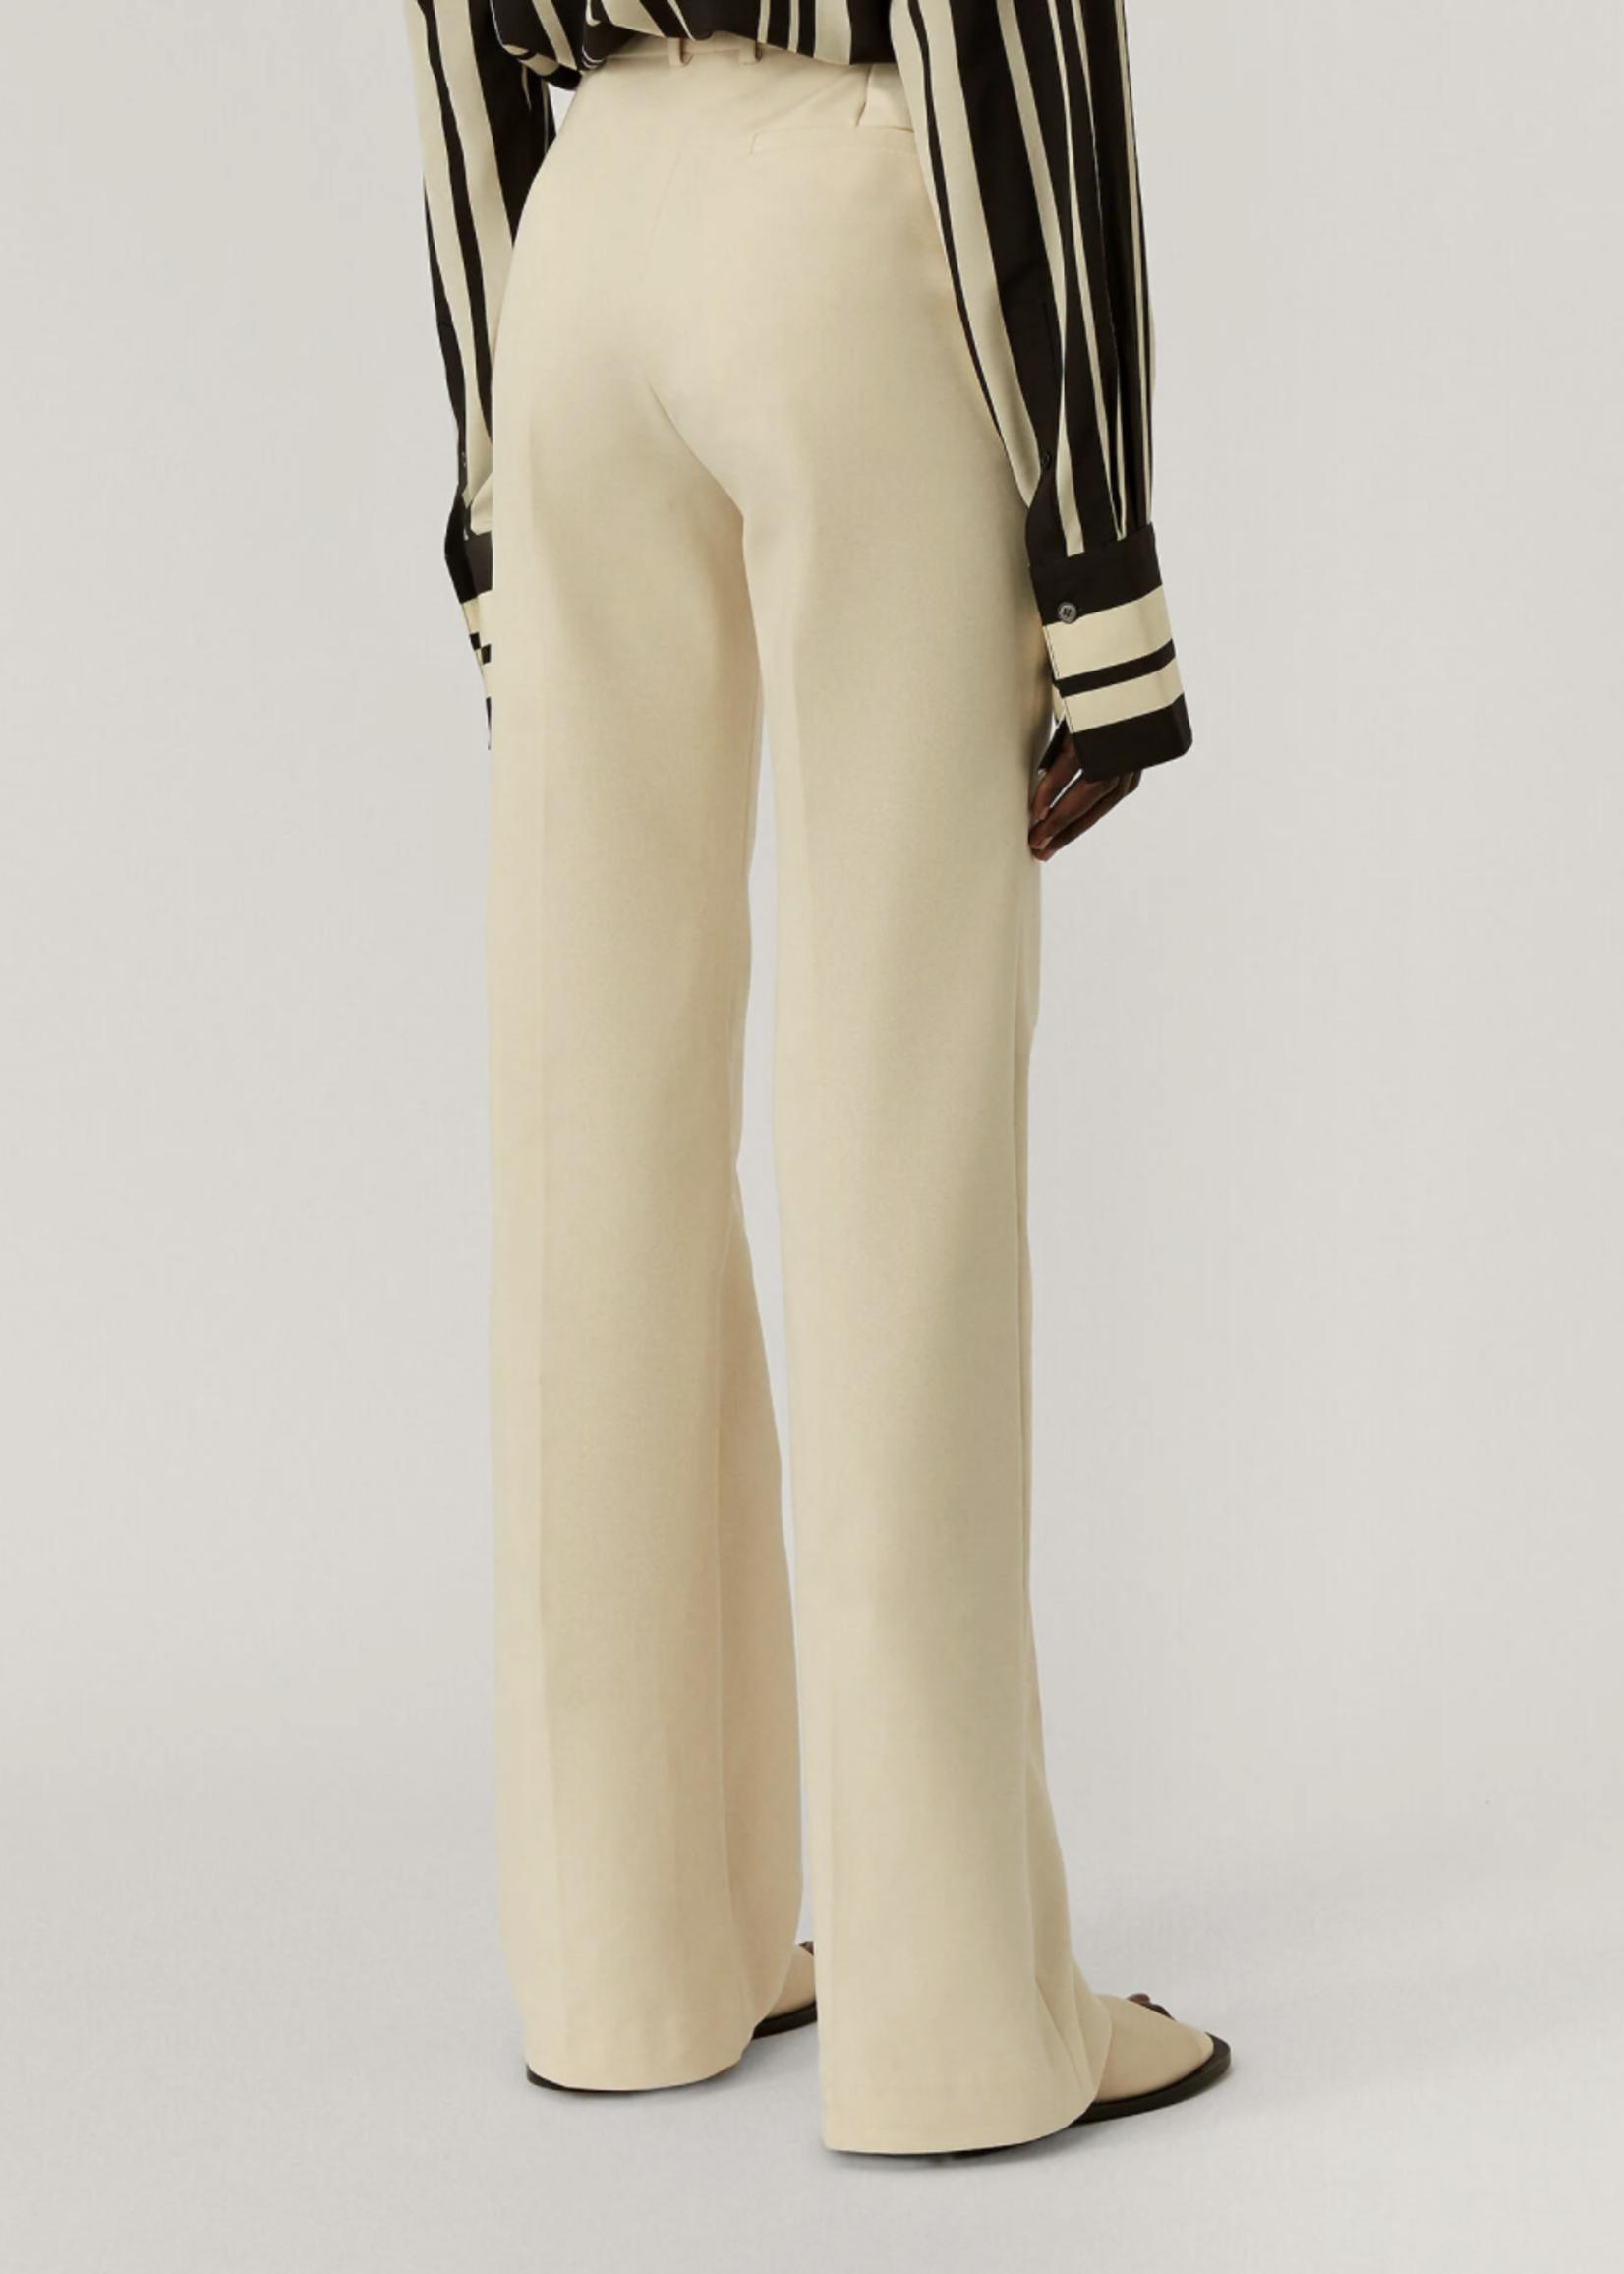 Joseph joseph richard bi stretch straight leg pants, ivory